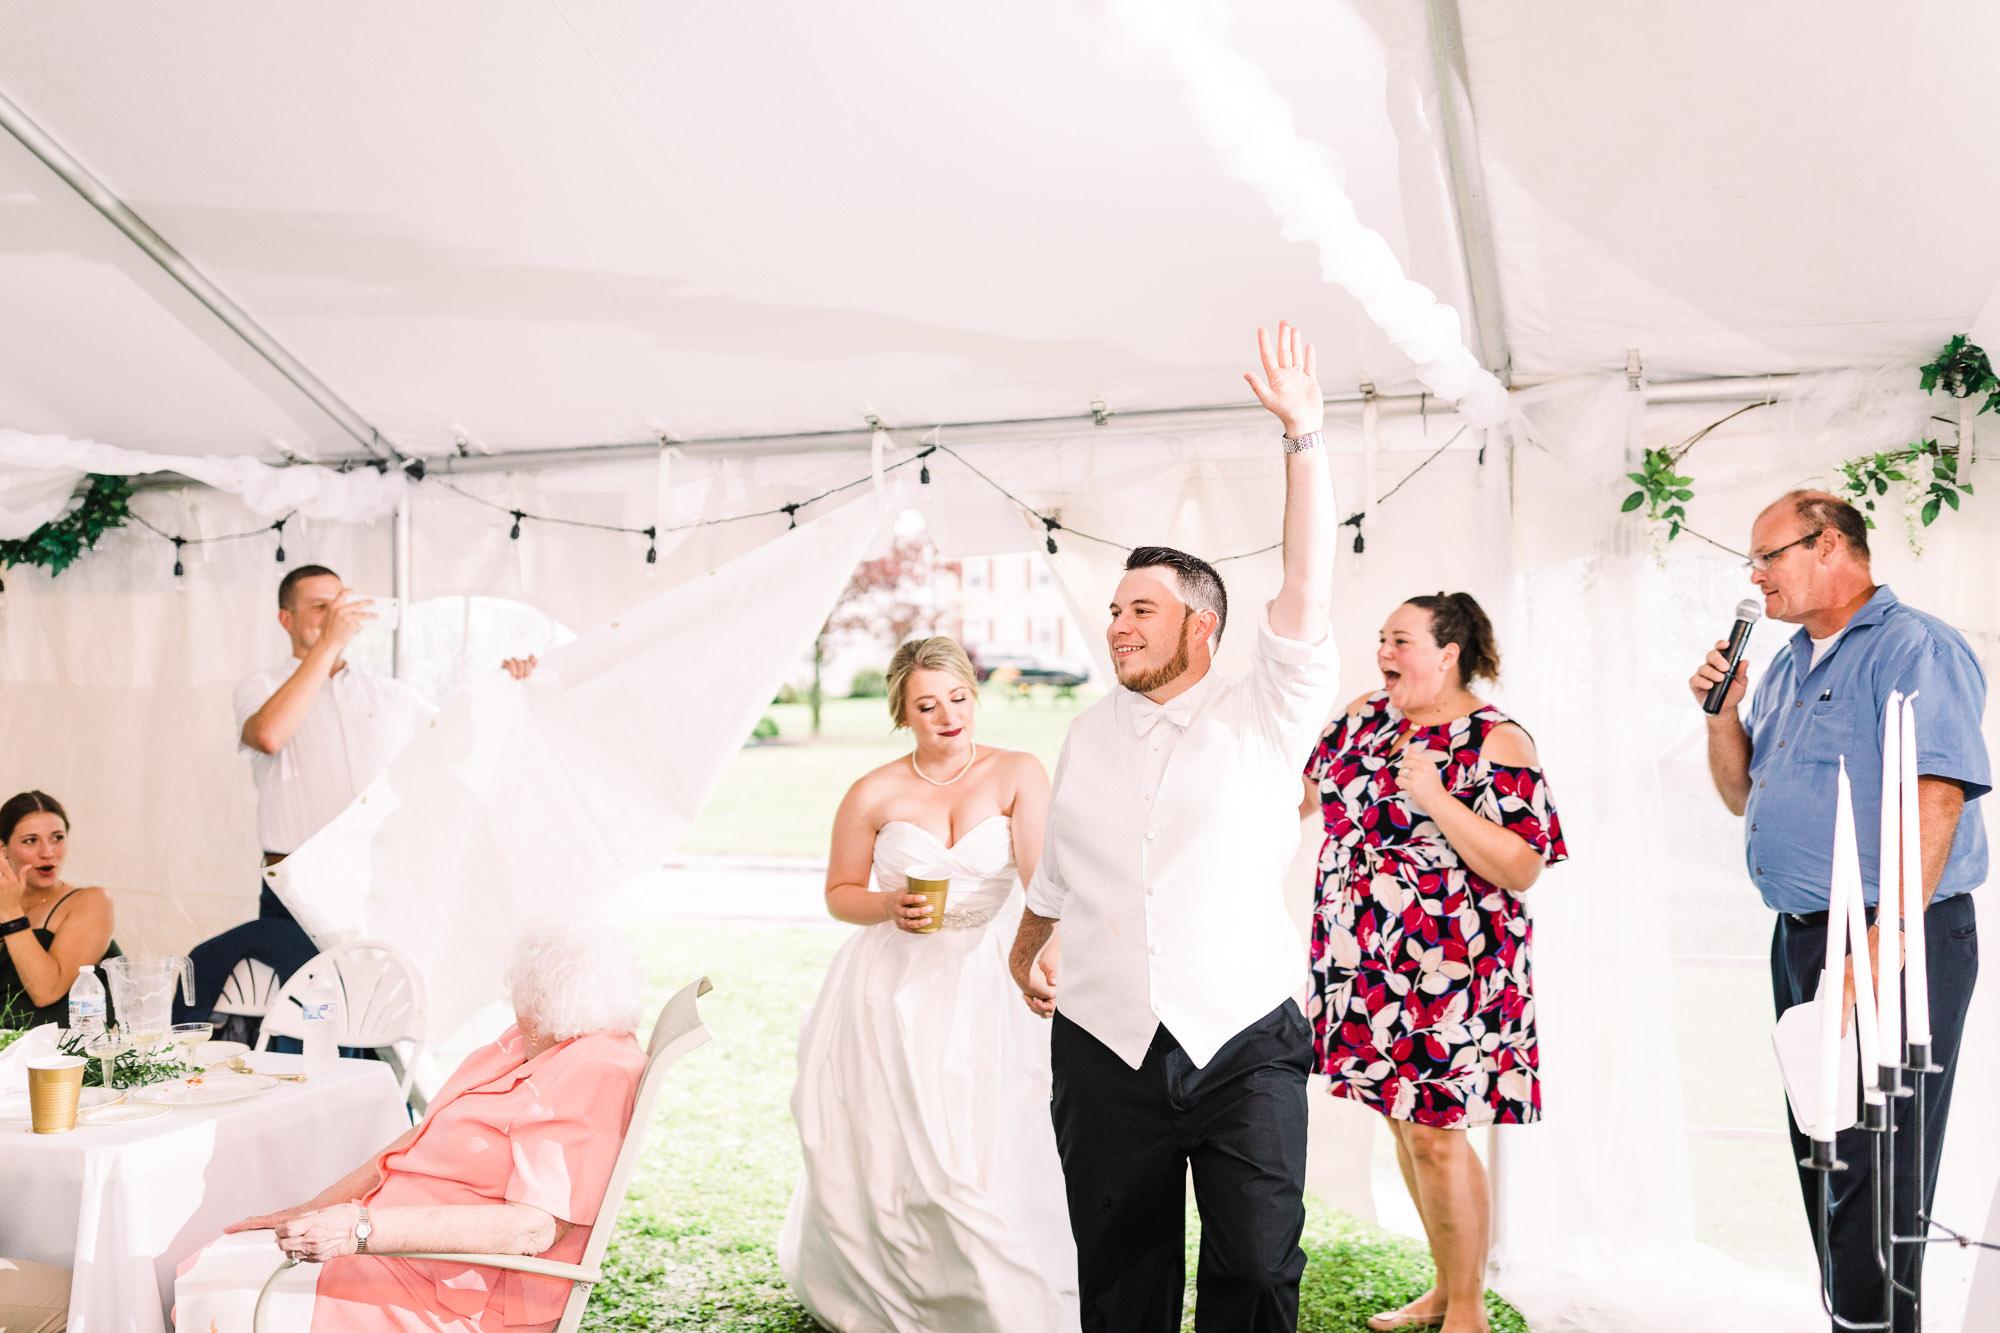 isle-of-que-wedding-7066.jpg